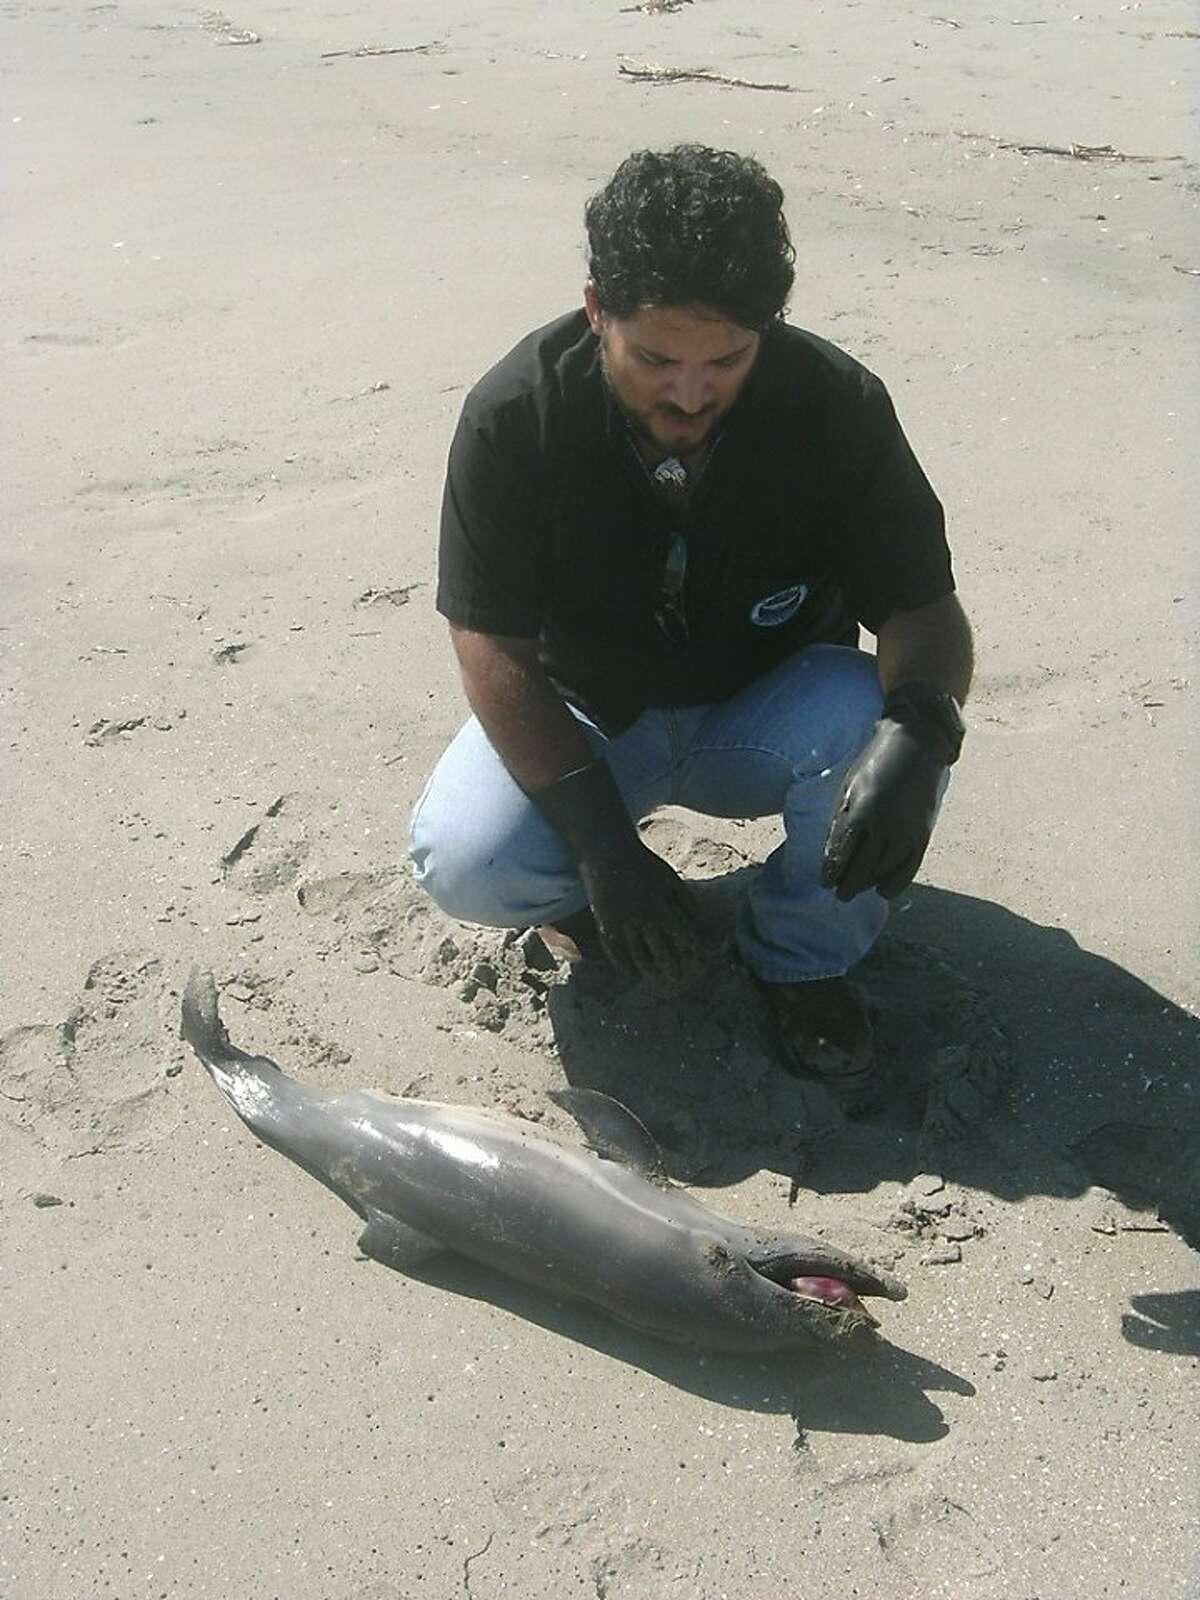 A handout photo shows Peruvian veterinarian Carlos YaipŽn encountering a dying dolphin along Peru's northern coast.